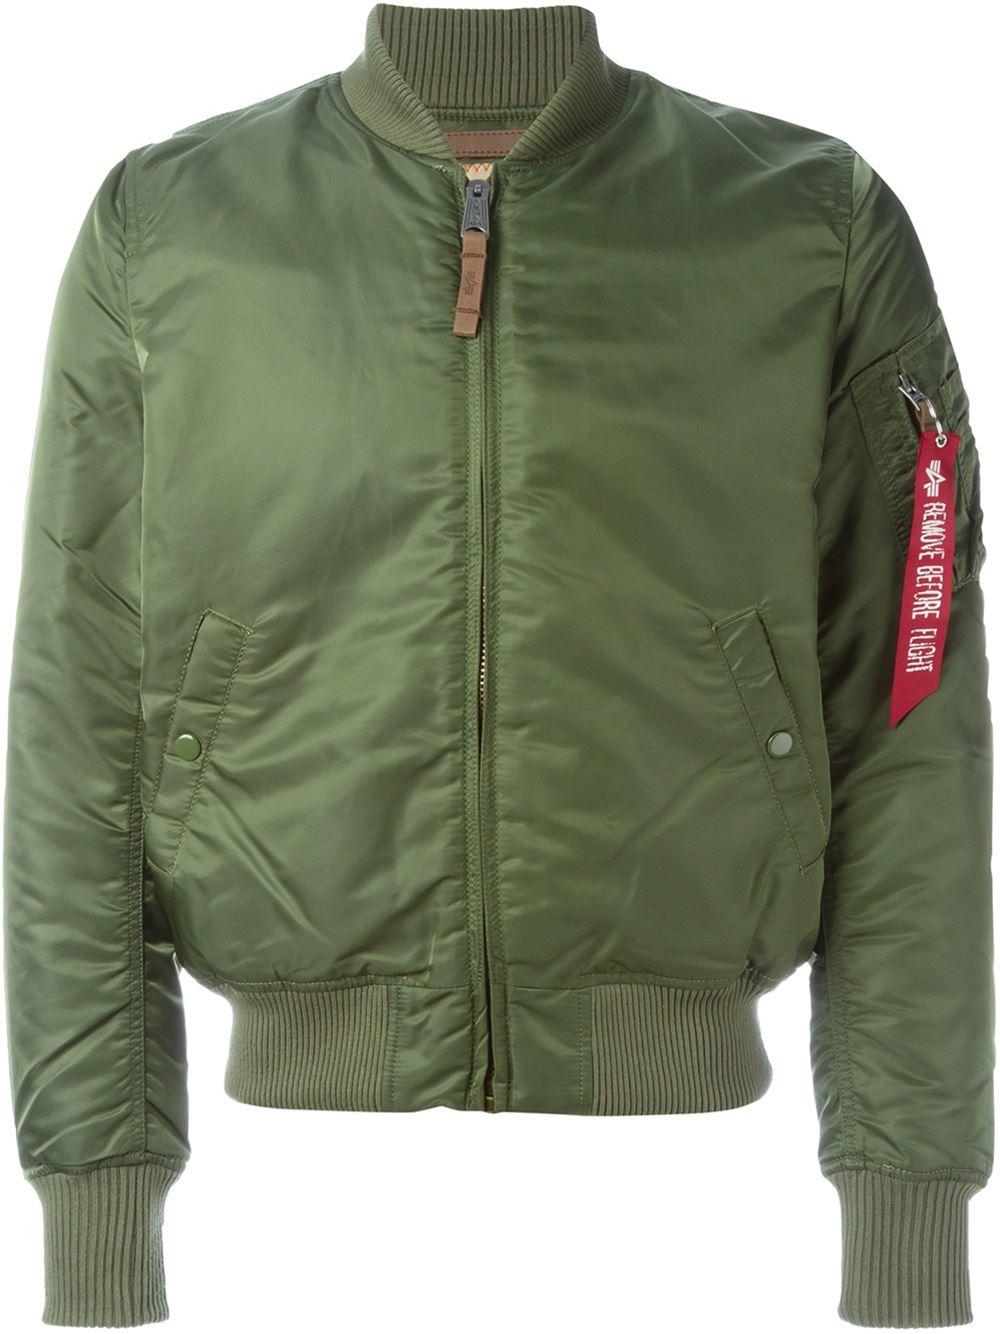 alpha industries 39 ma 1 39 flight jacket in green for men lyst. Black Bedroom Furniture Sets. Home Design Ideas